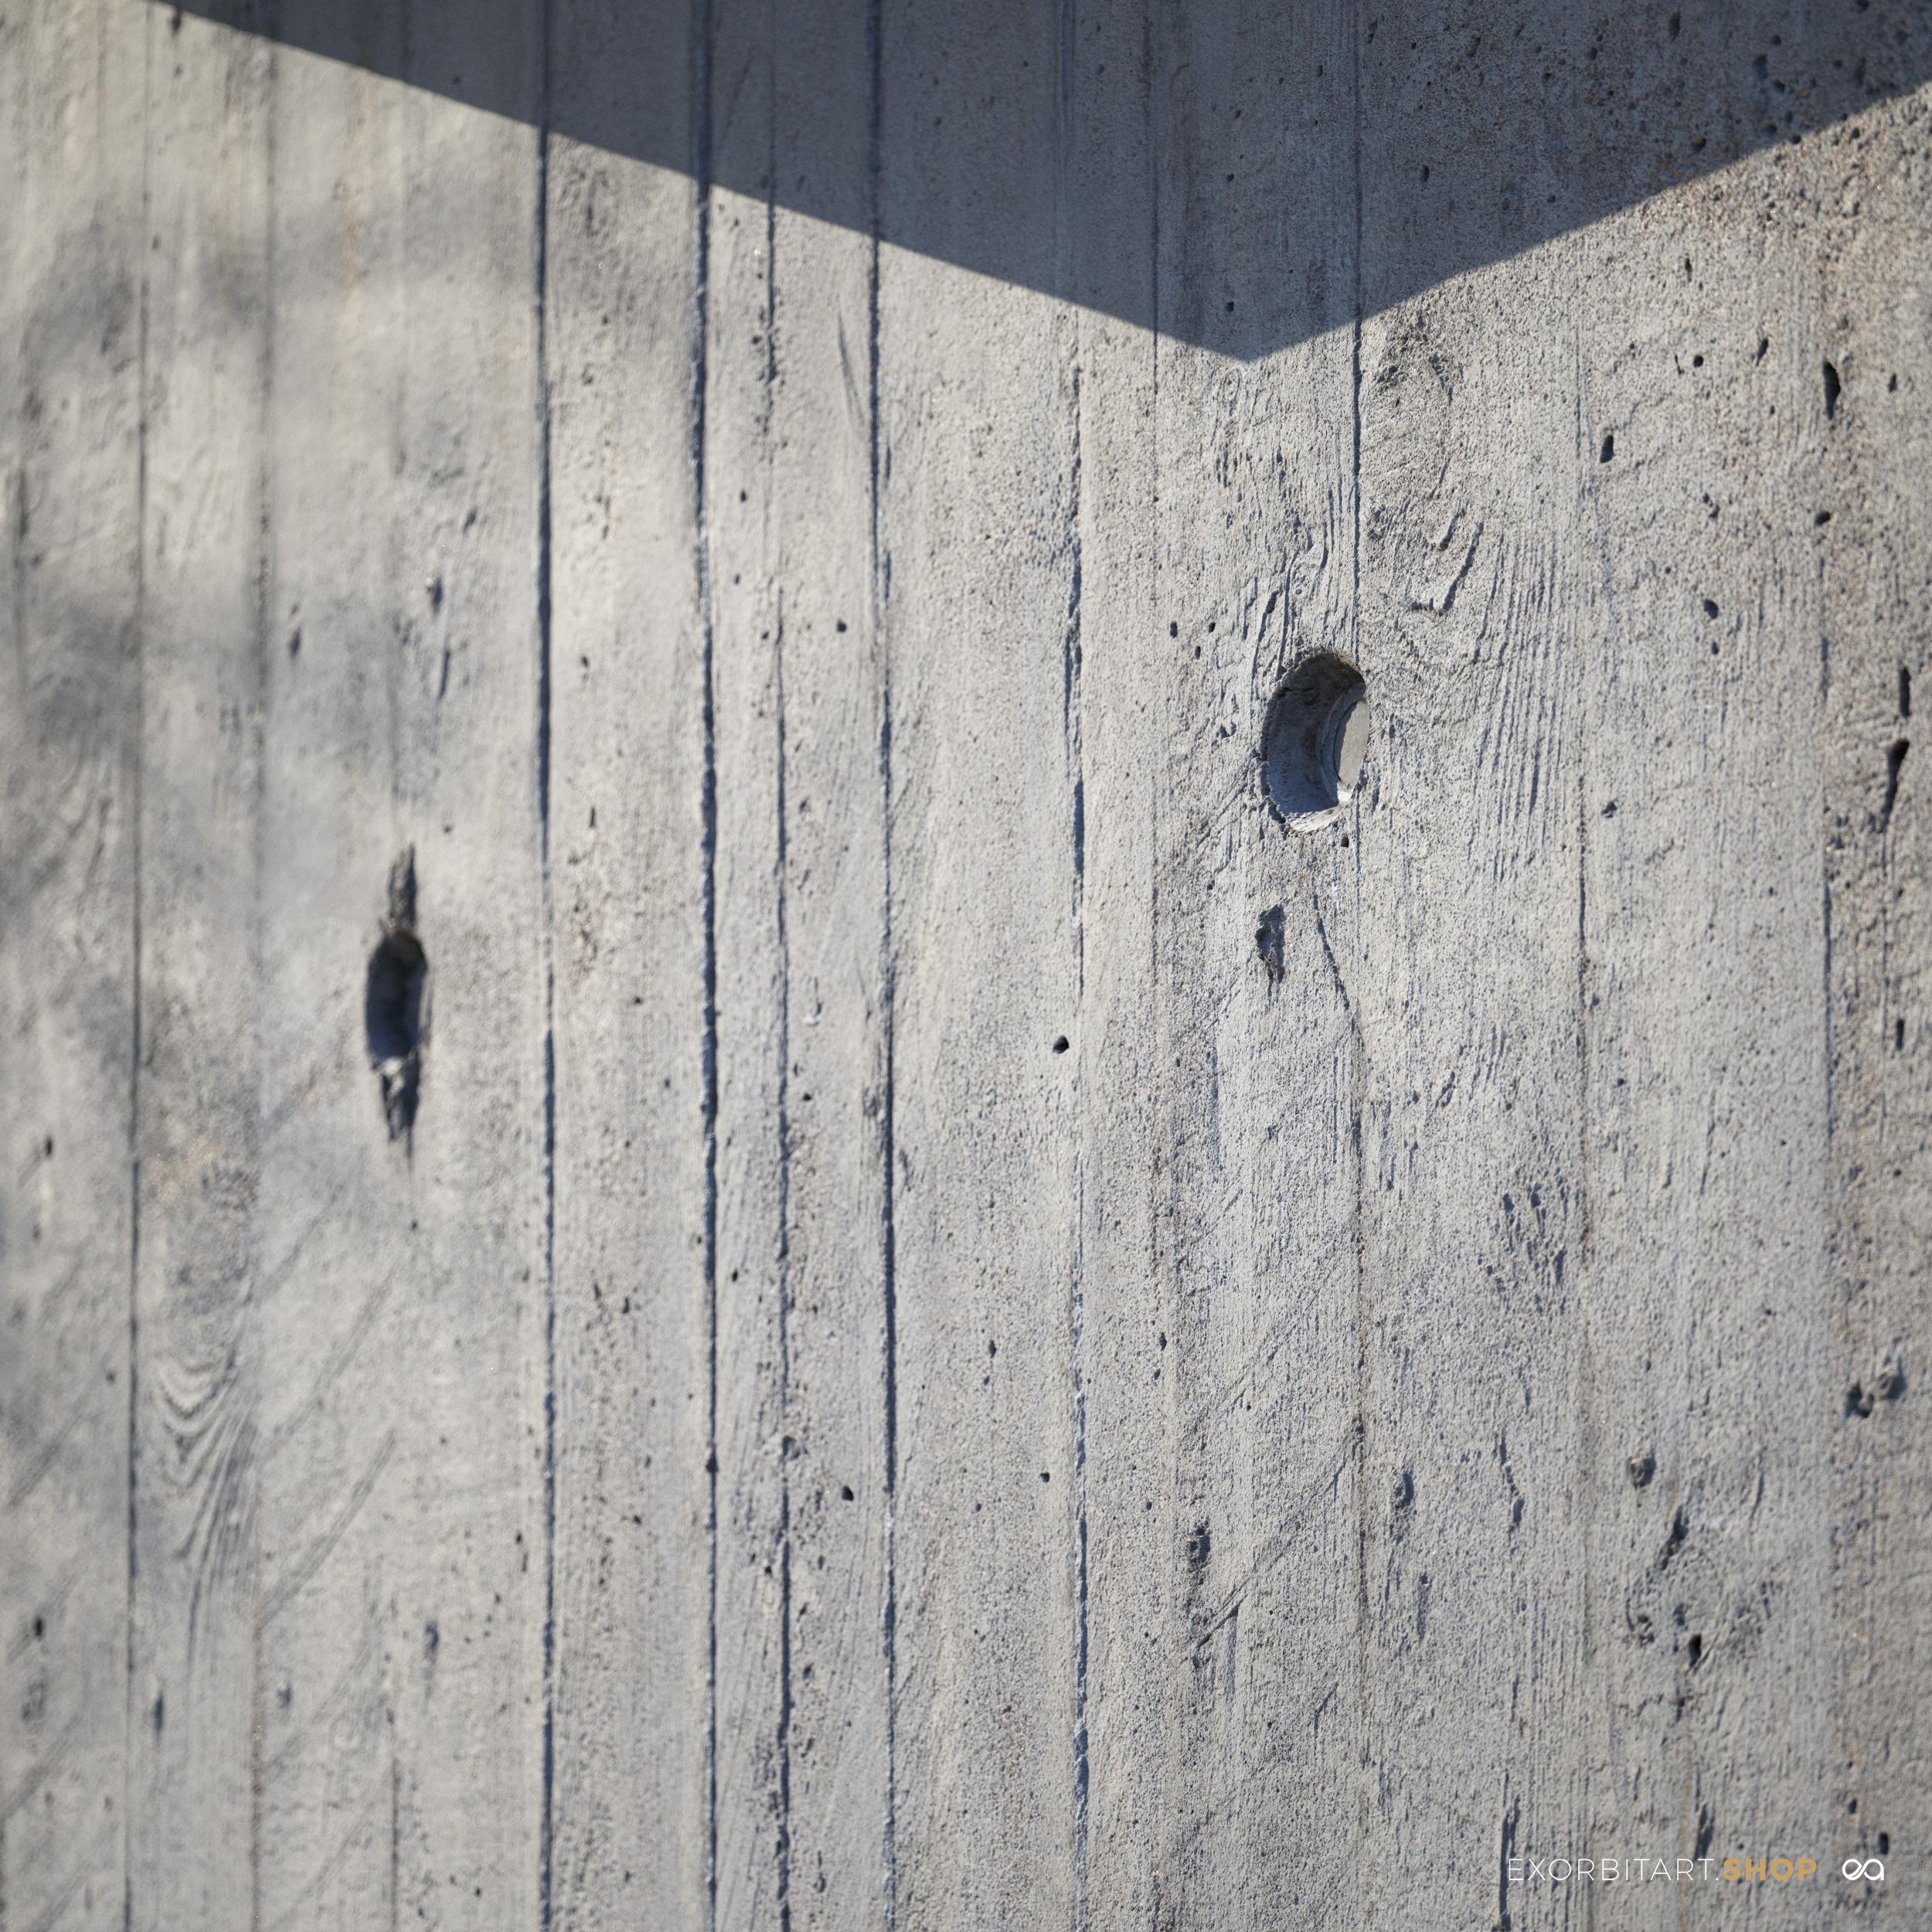 scanned bare concrete close-up